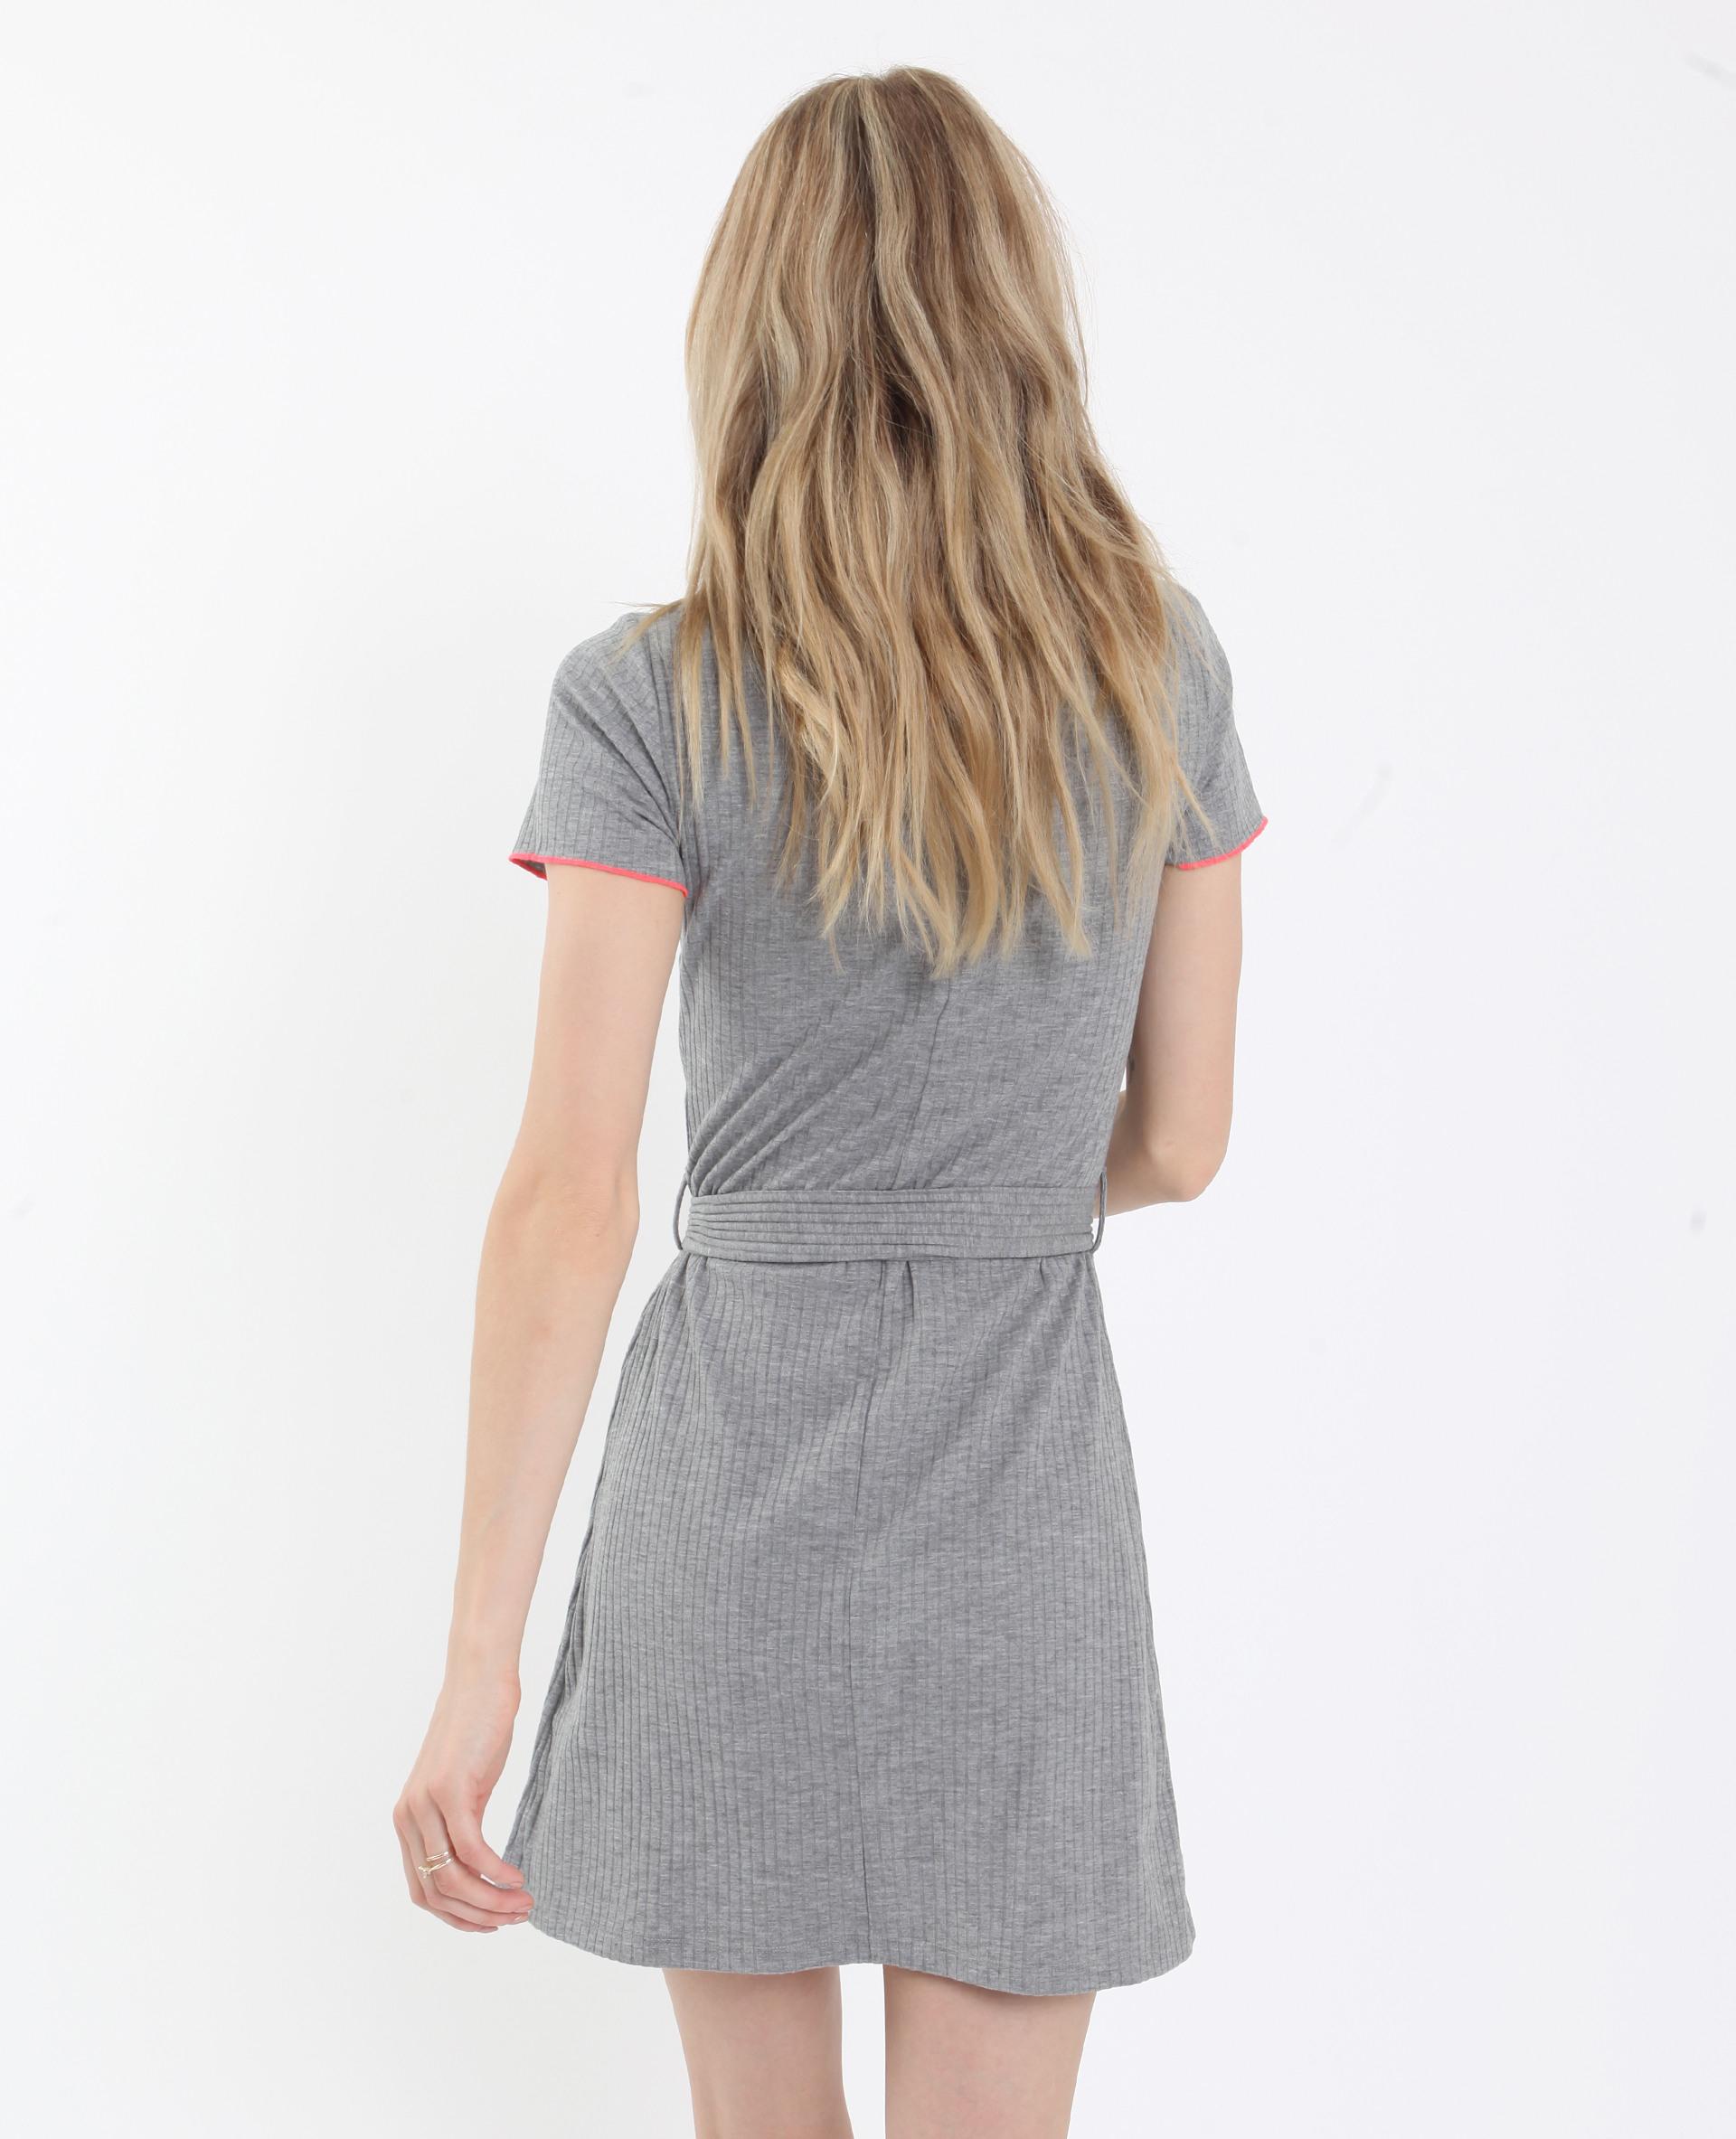 Geripptes Kleid Grau  781270817A08  Pimkie